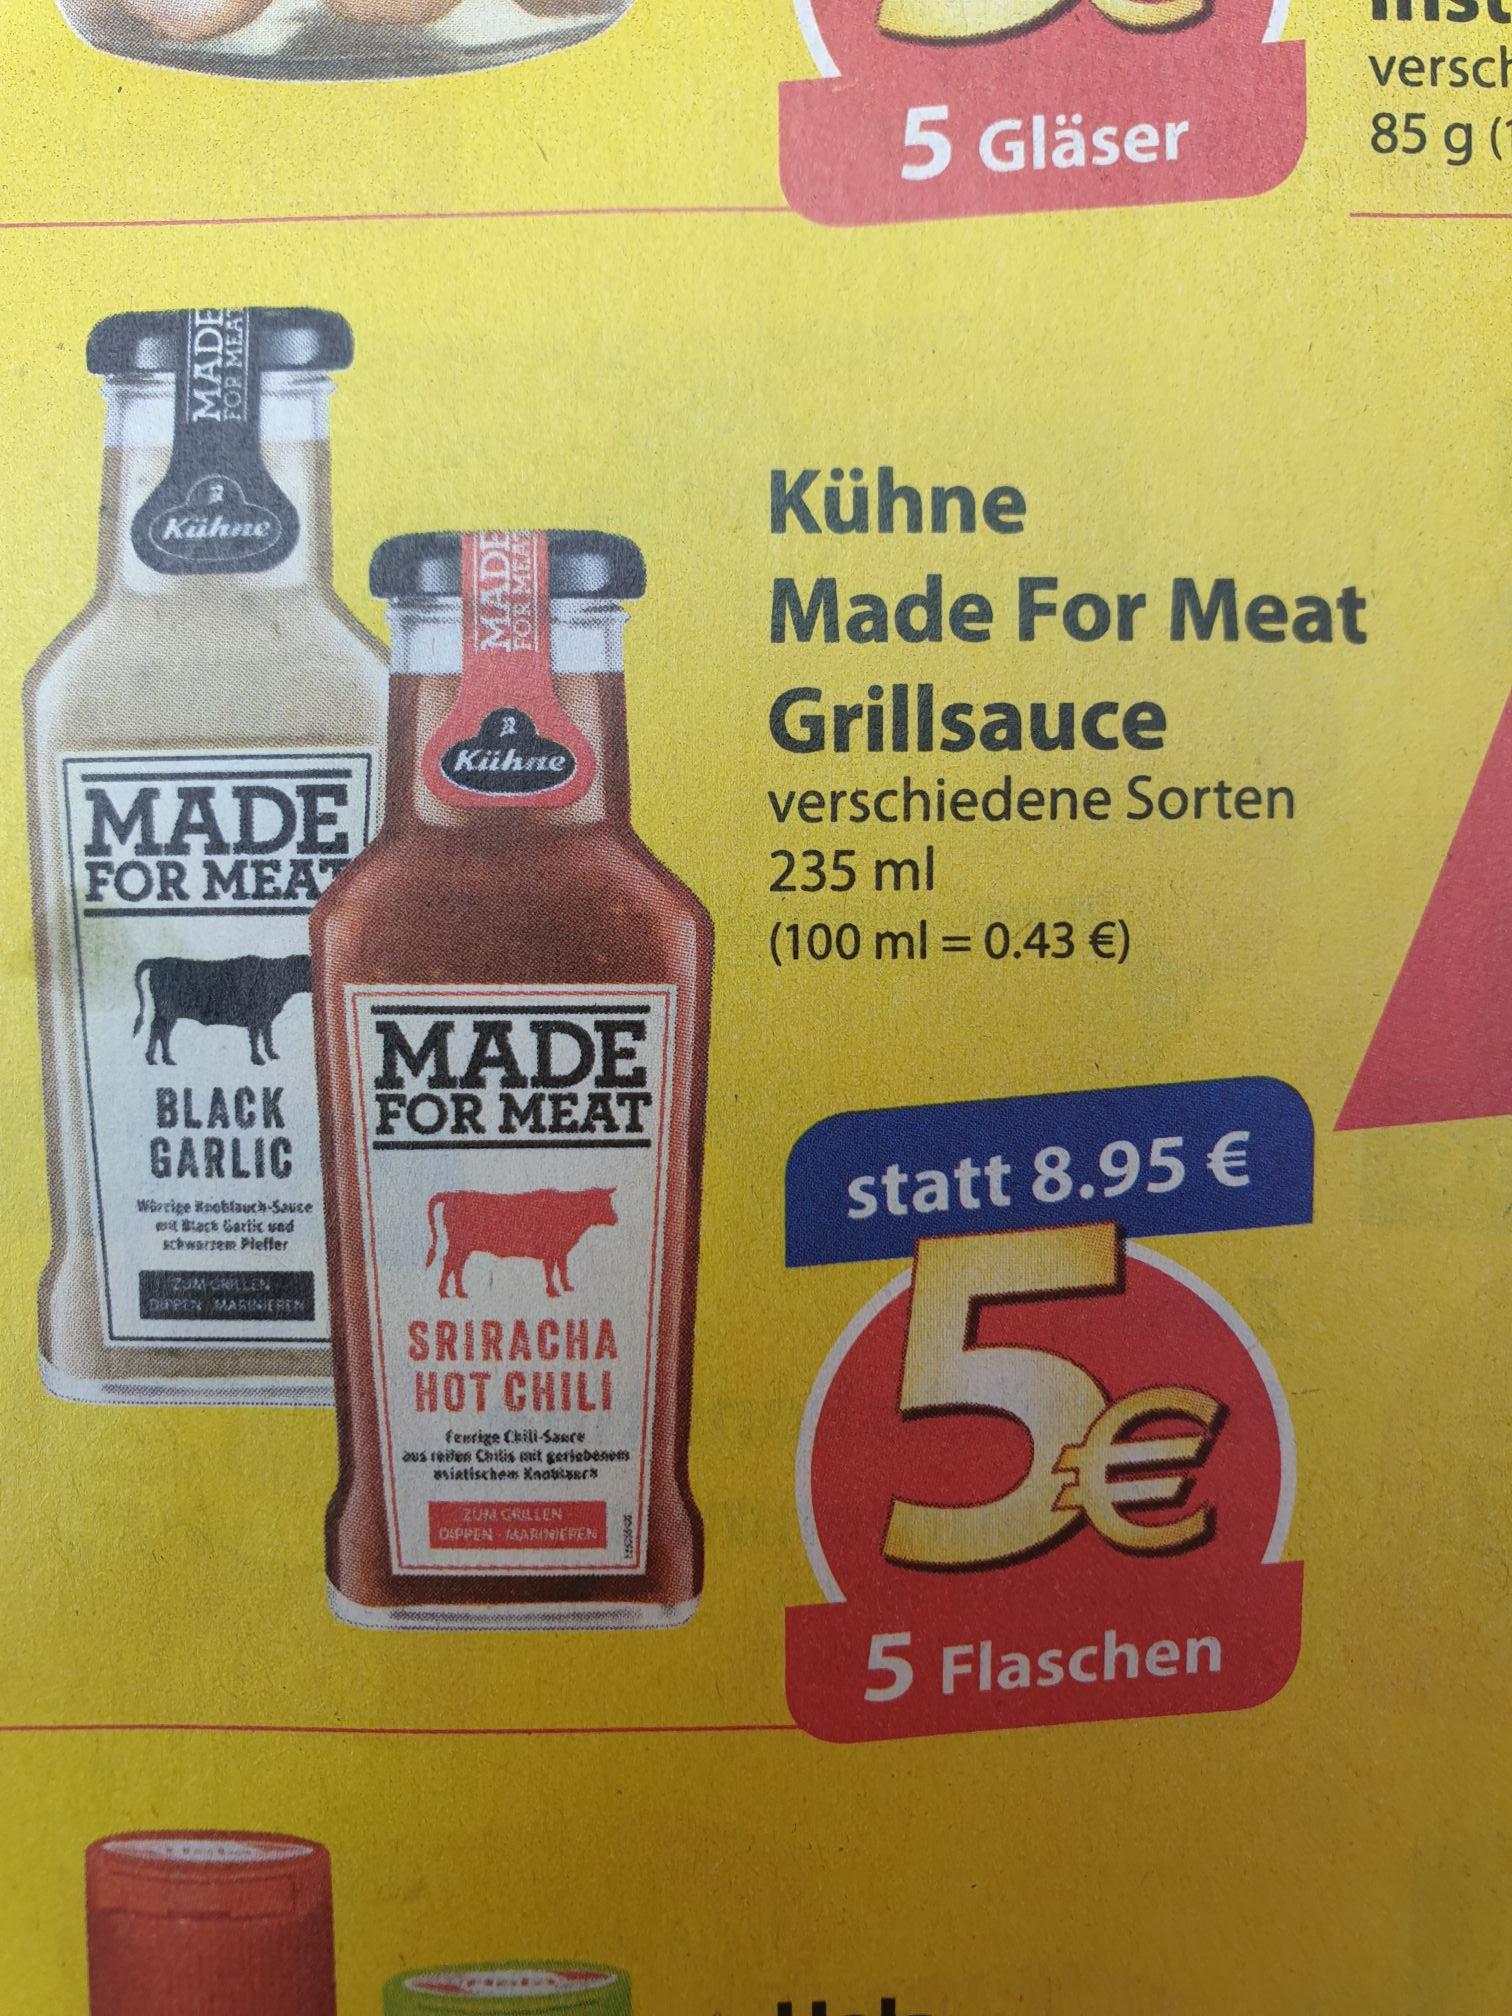 Famila nordost Sammeldeal alles für 5€ ! 5x Kühne made for Meat,10x Katjes, 8x Buitoni Pasta, 5x Nimm 2 usw.